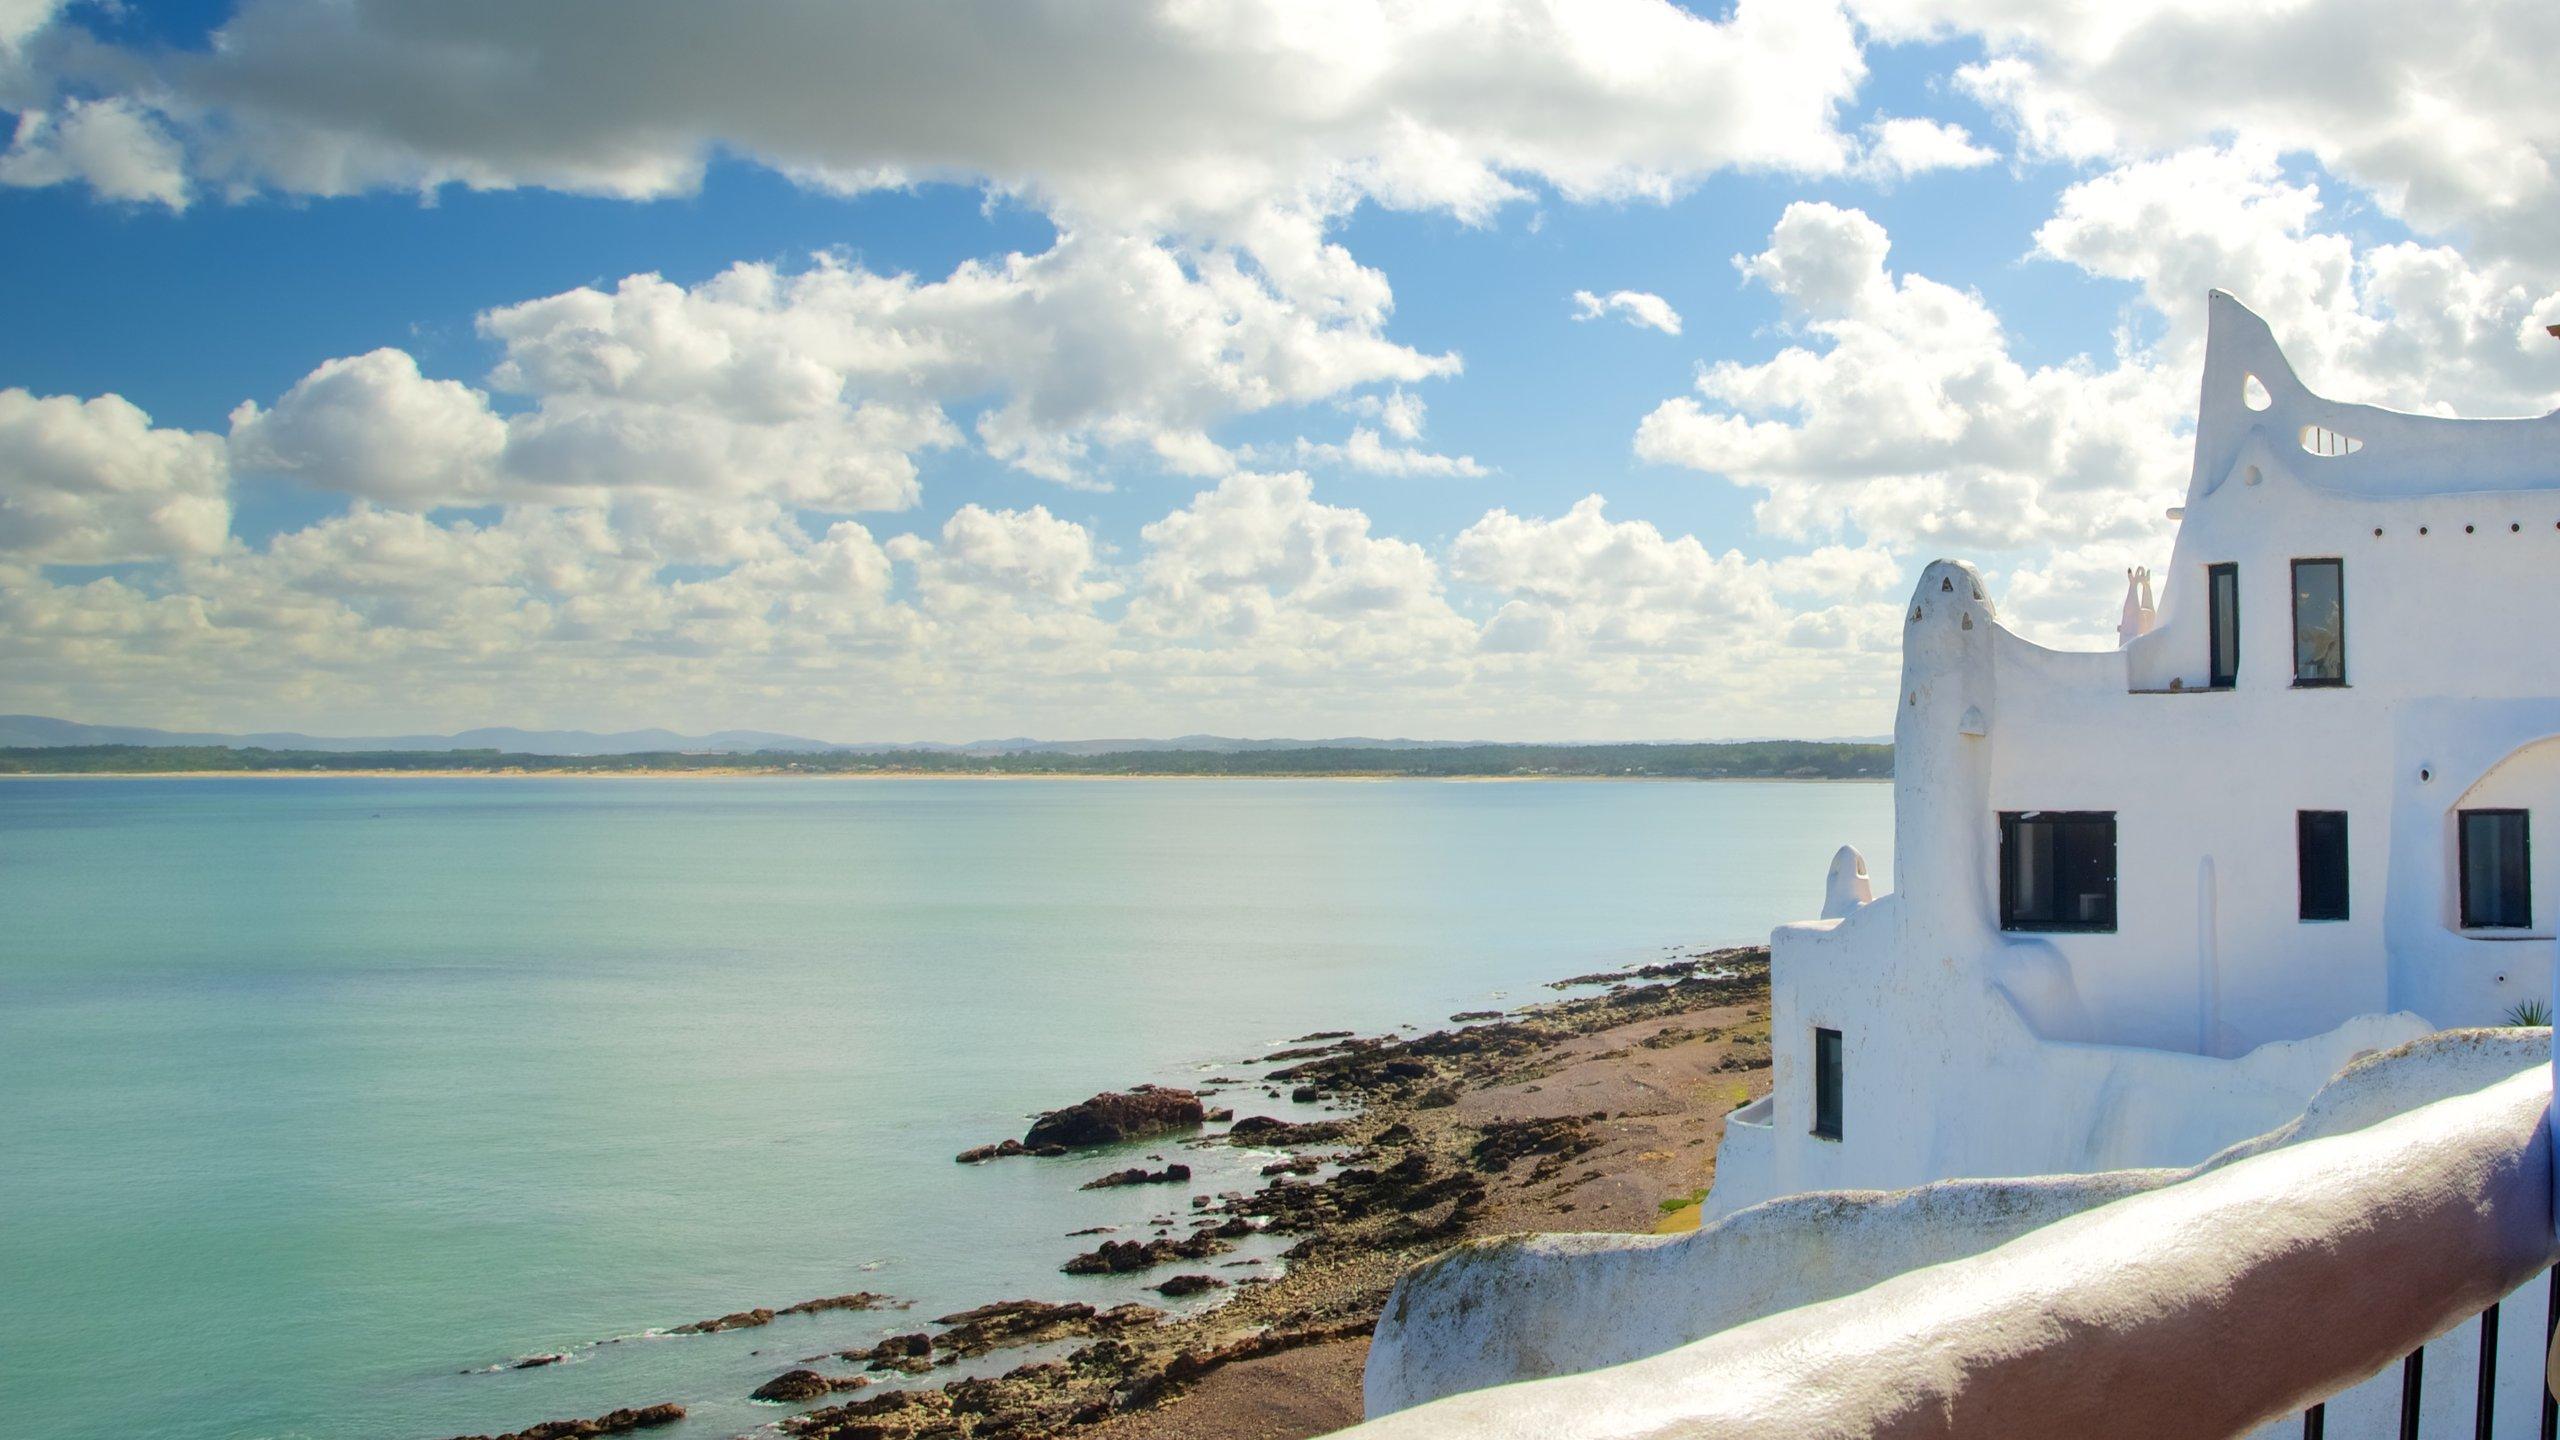 Punta Ballena, Maldonado, Uruguay